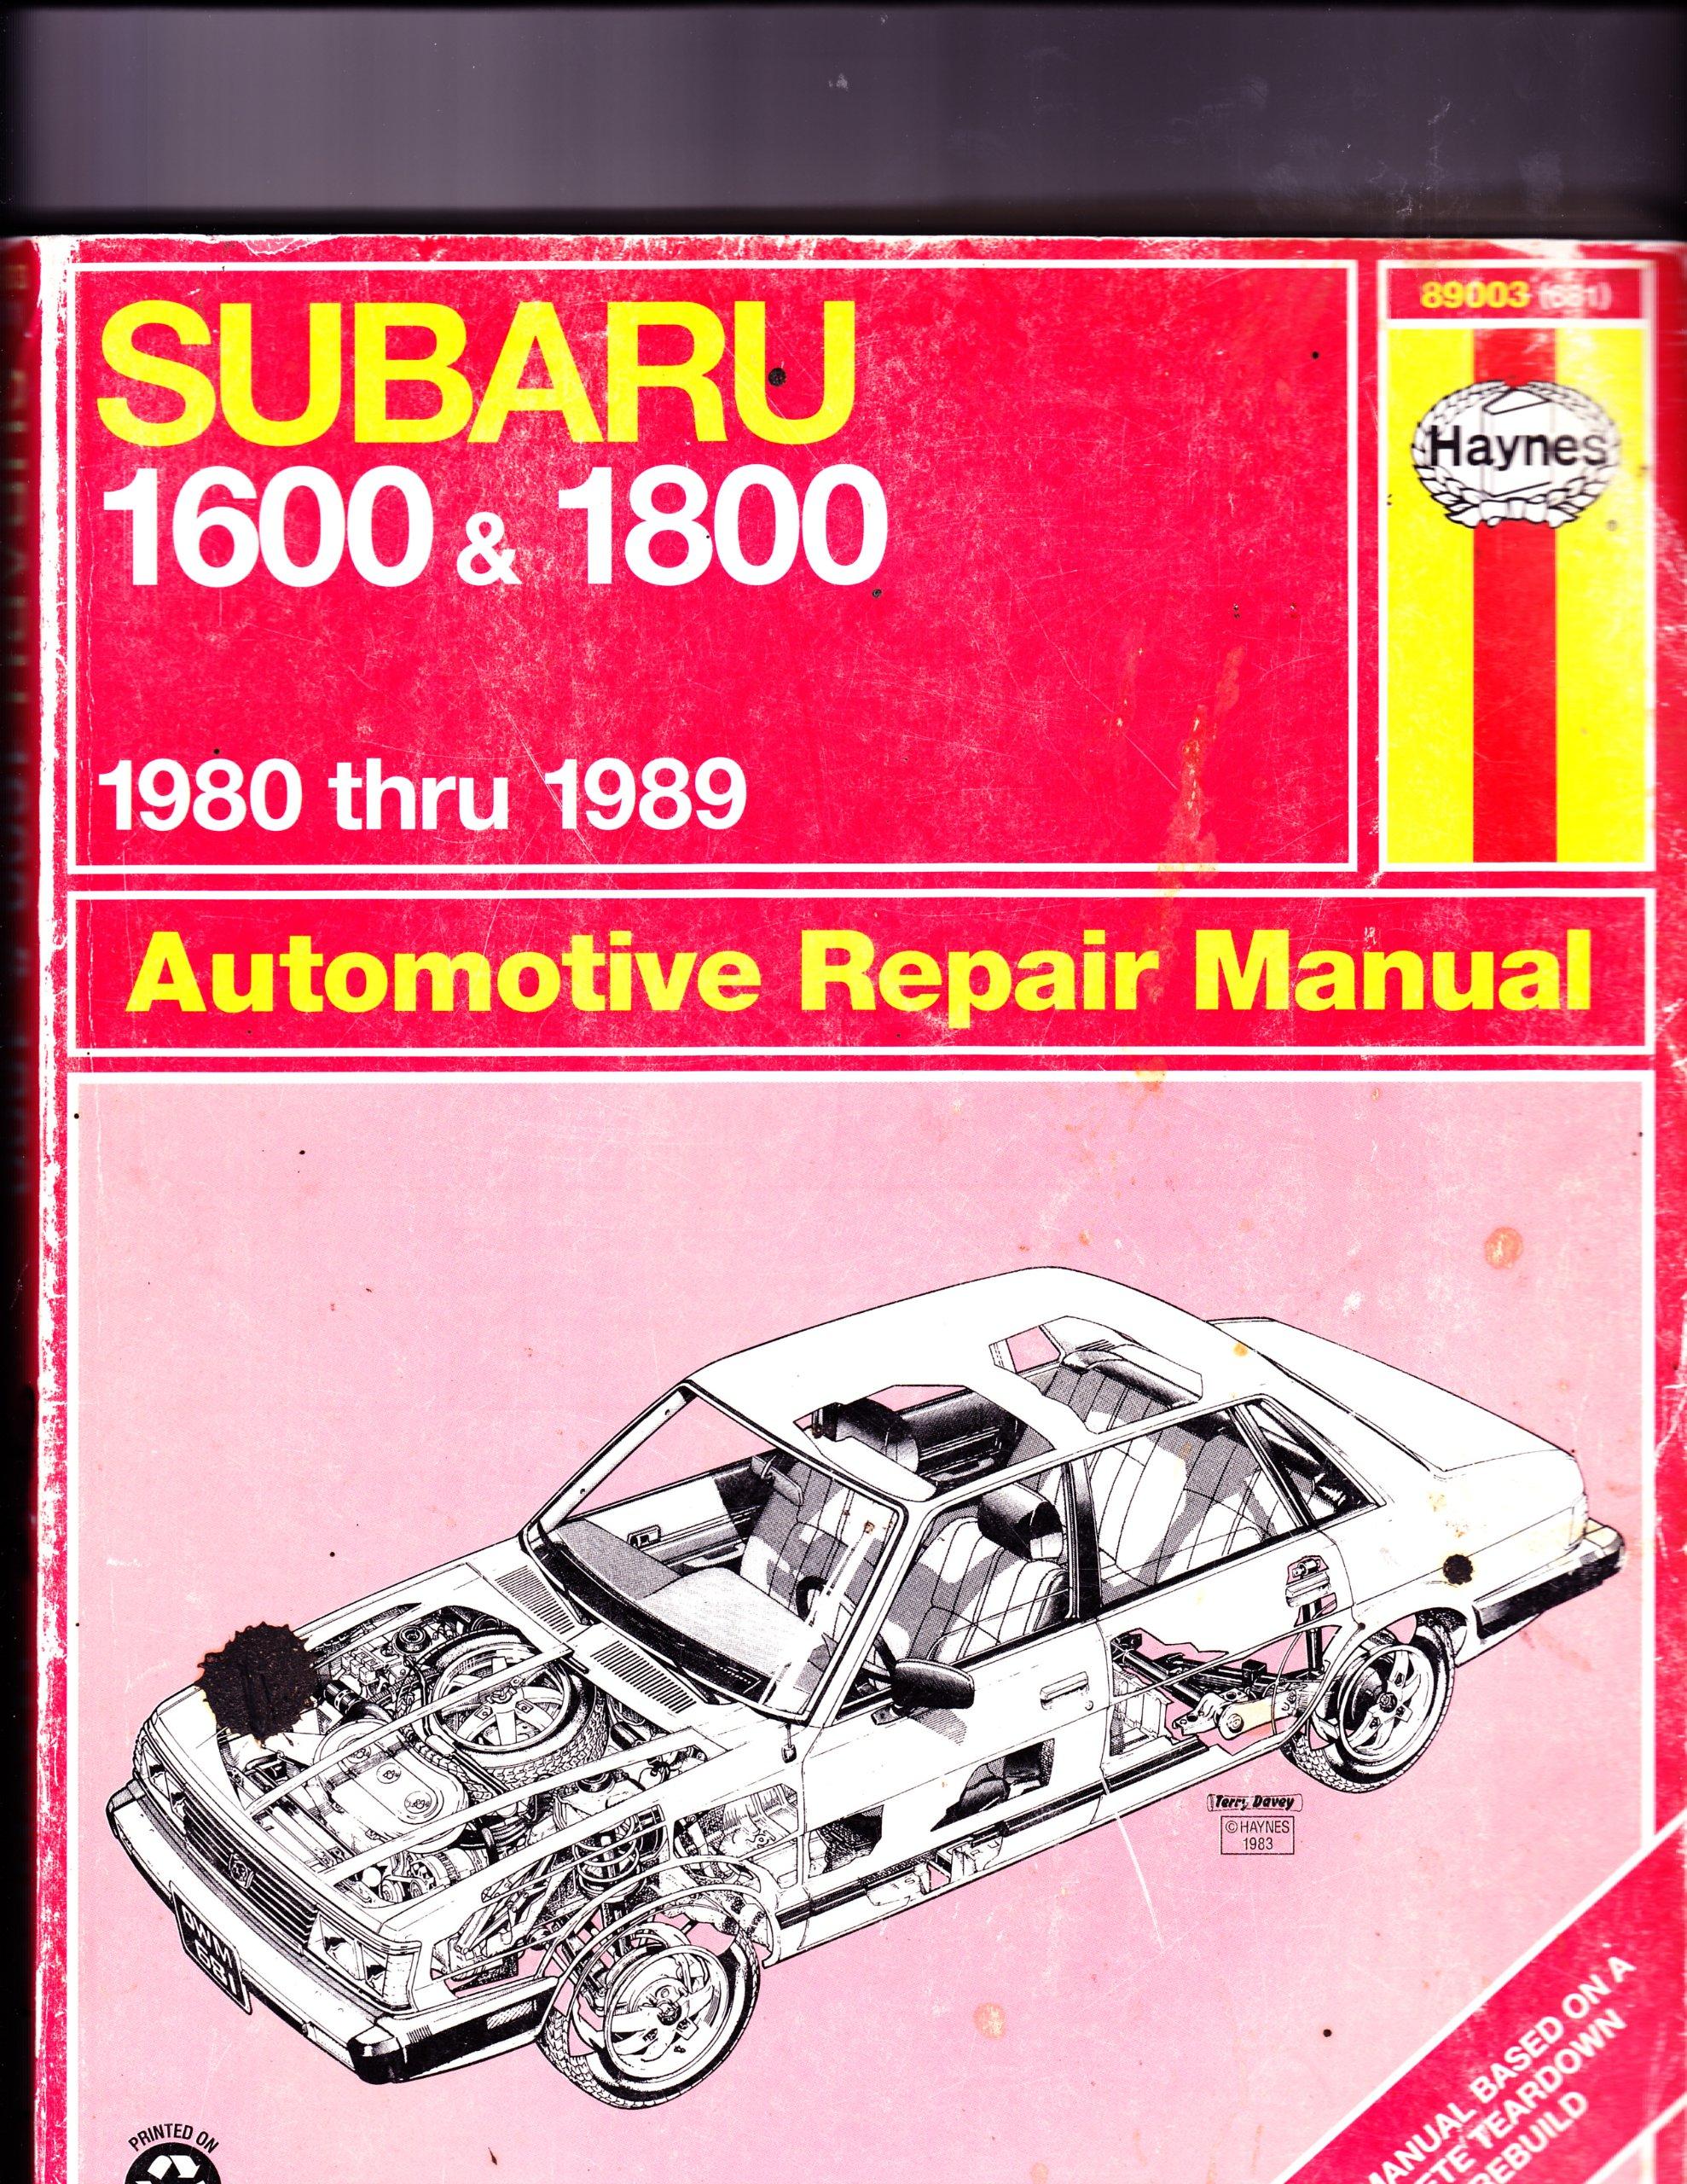 Subaru 1600 and 1800 1980 Thru 1989 Automotive Repair Manual (Book No 681):  Haynes: 9781850107019: Amazon.com: Books